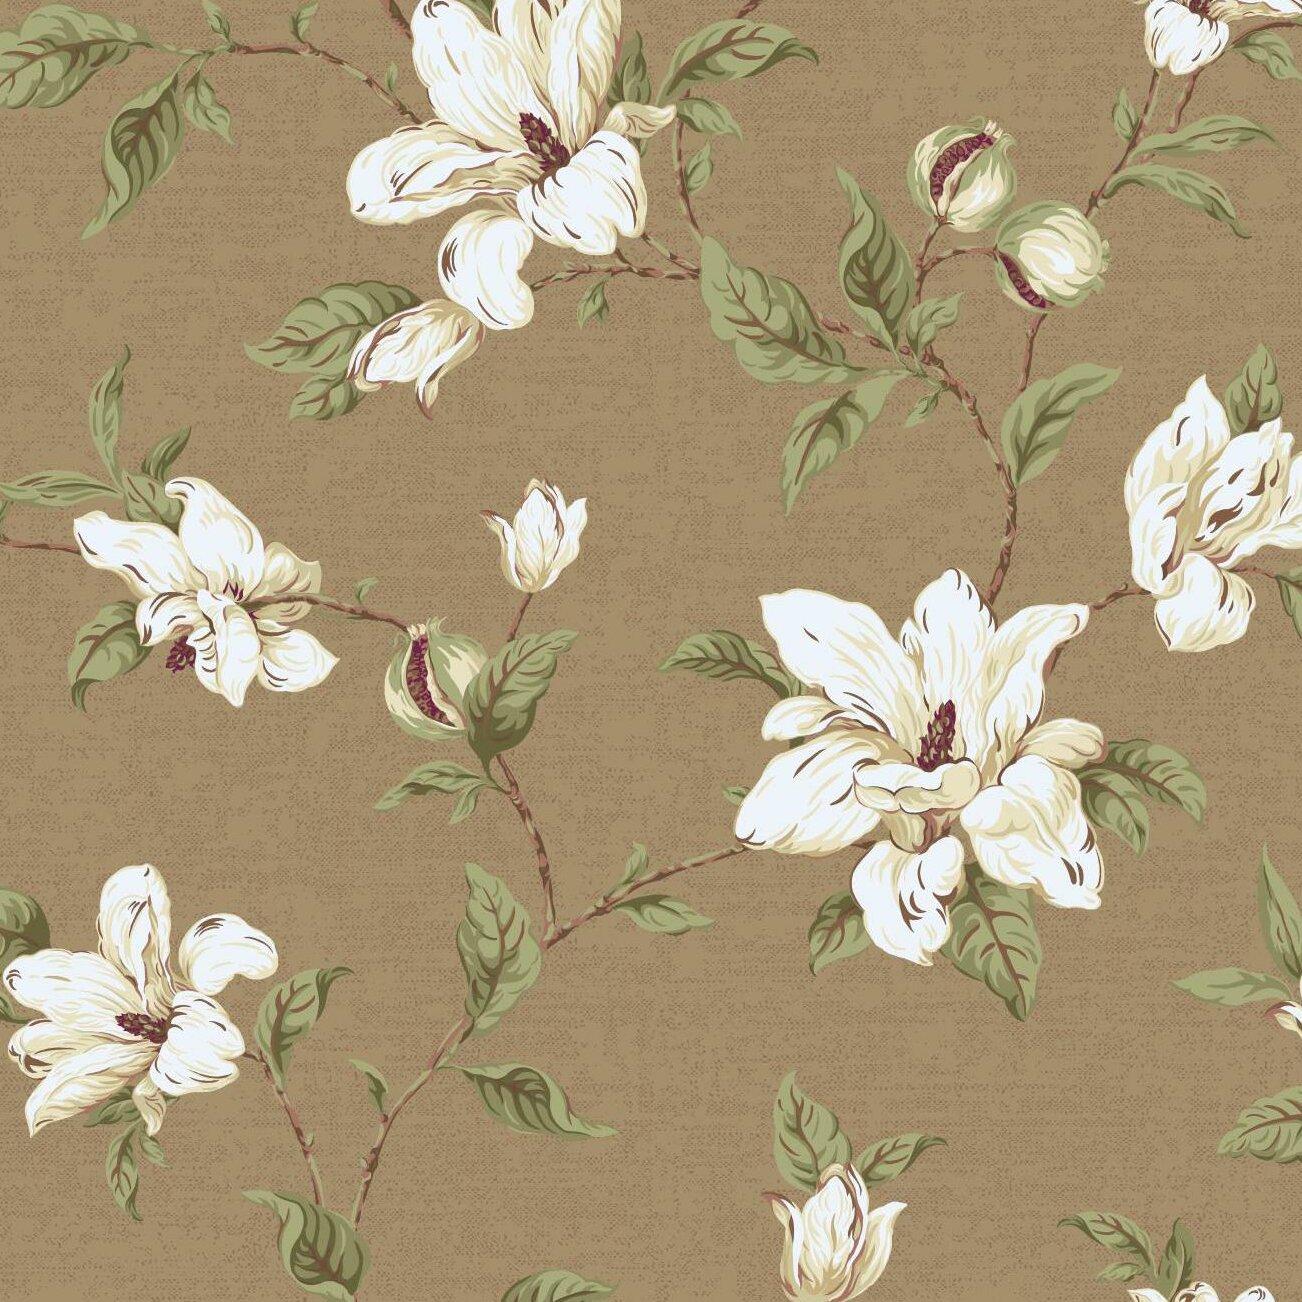 WHITE MAGNOLIAS SATIN FINISH MAUVE BACKROUND FLORAL Wallpaper bordeR Wall Decor